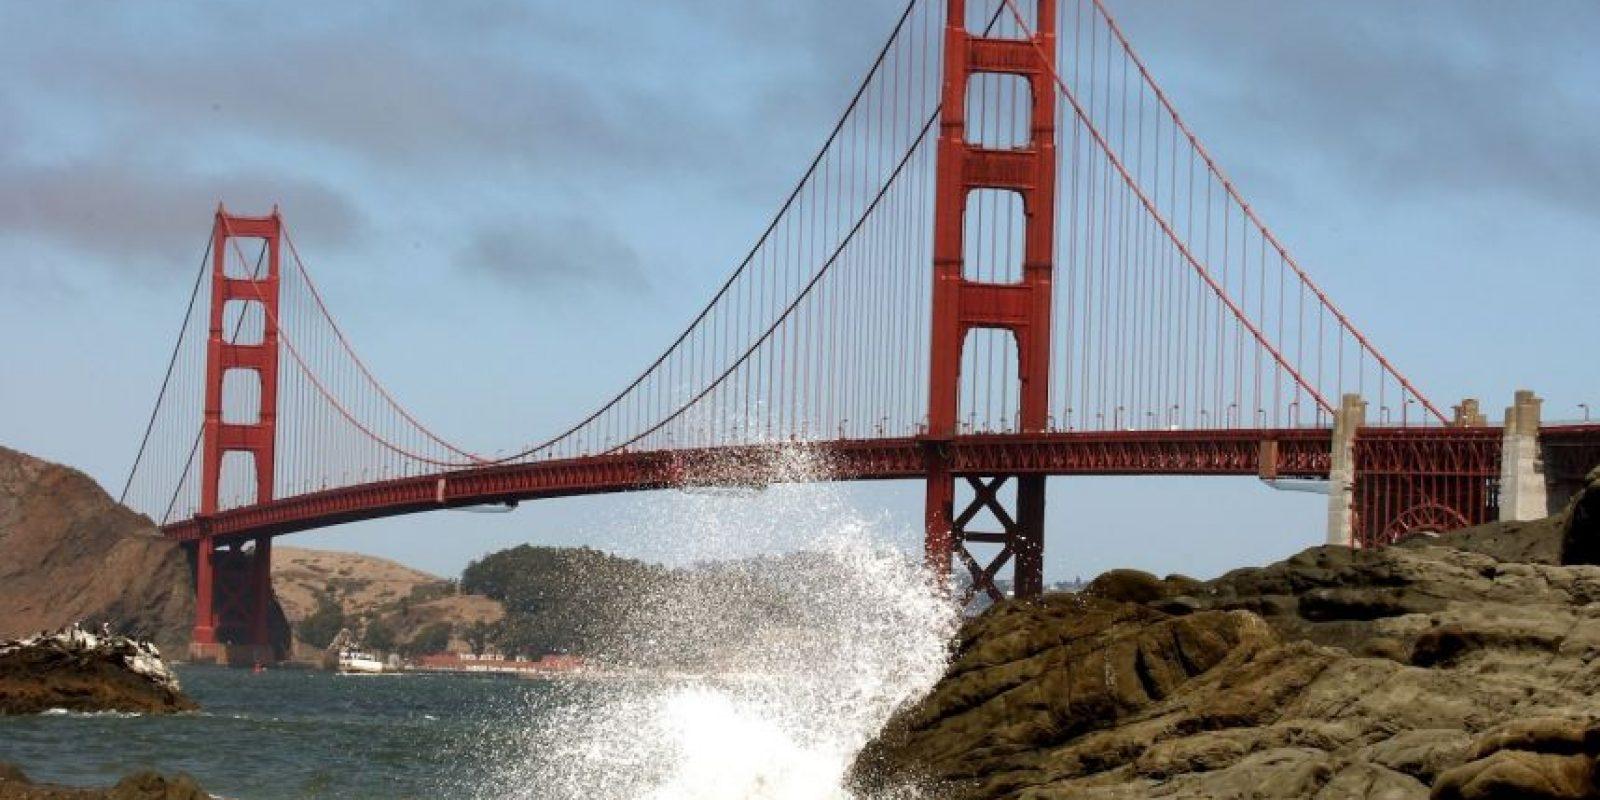 Además, la ciudad de San Francisco espera recaudar de mil 600 a 2 mil millones de dólares el fin de semana del Super Bowl. Foto:Getty Images